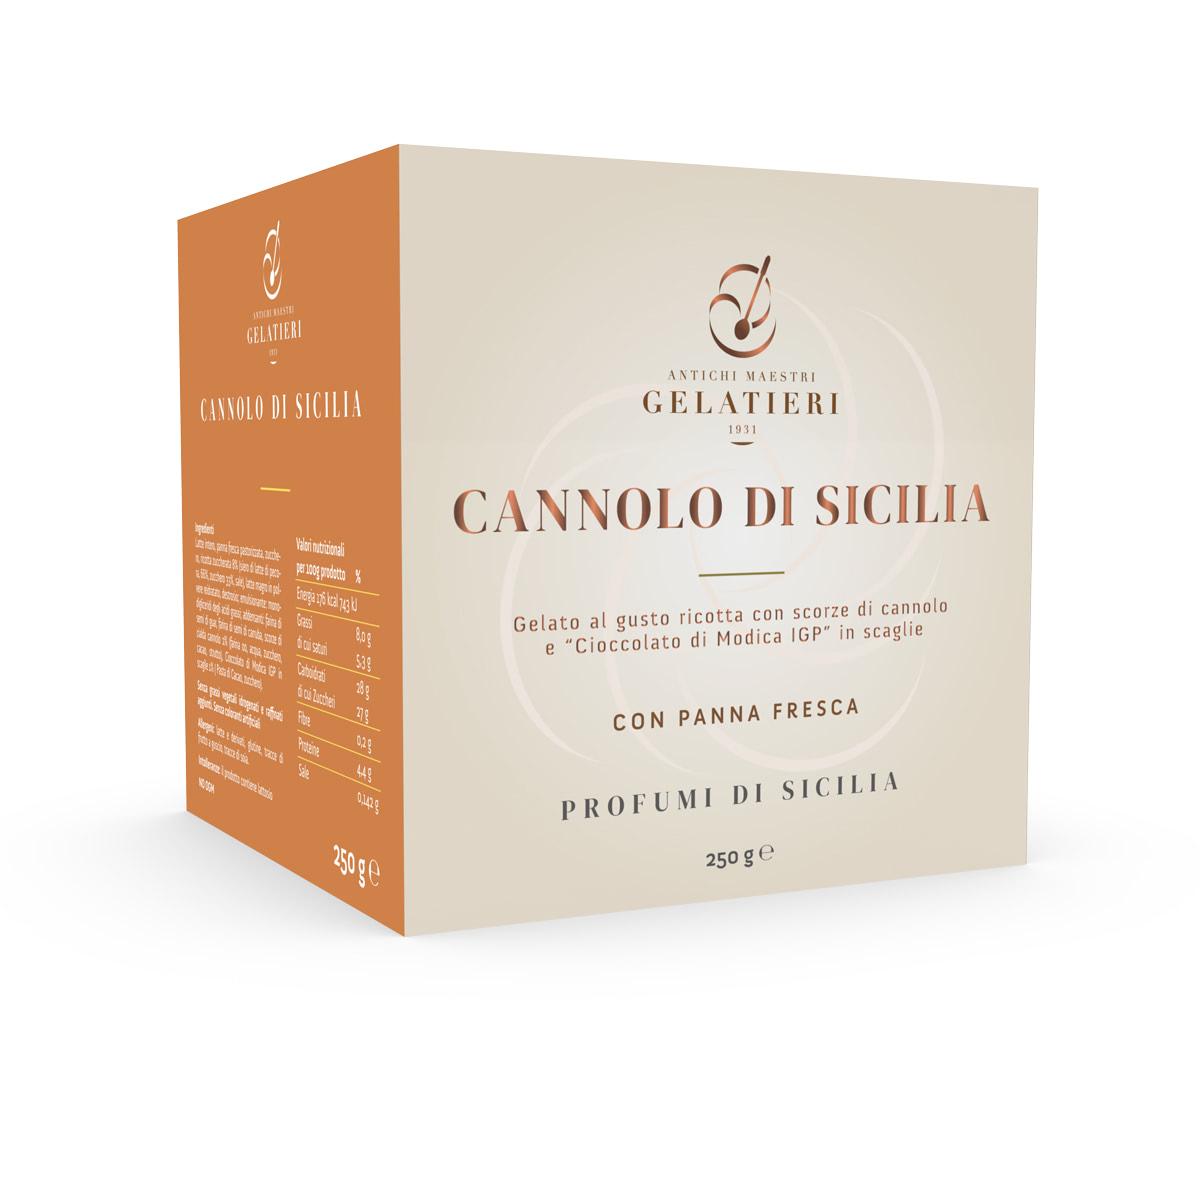 cubotti cannolo di sicilia - antichi maestri gelatieri